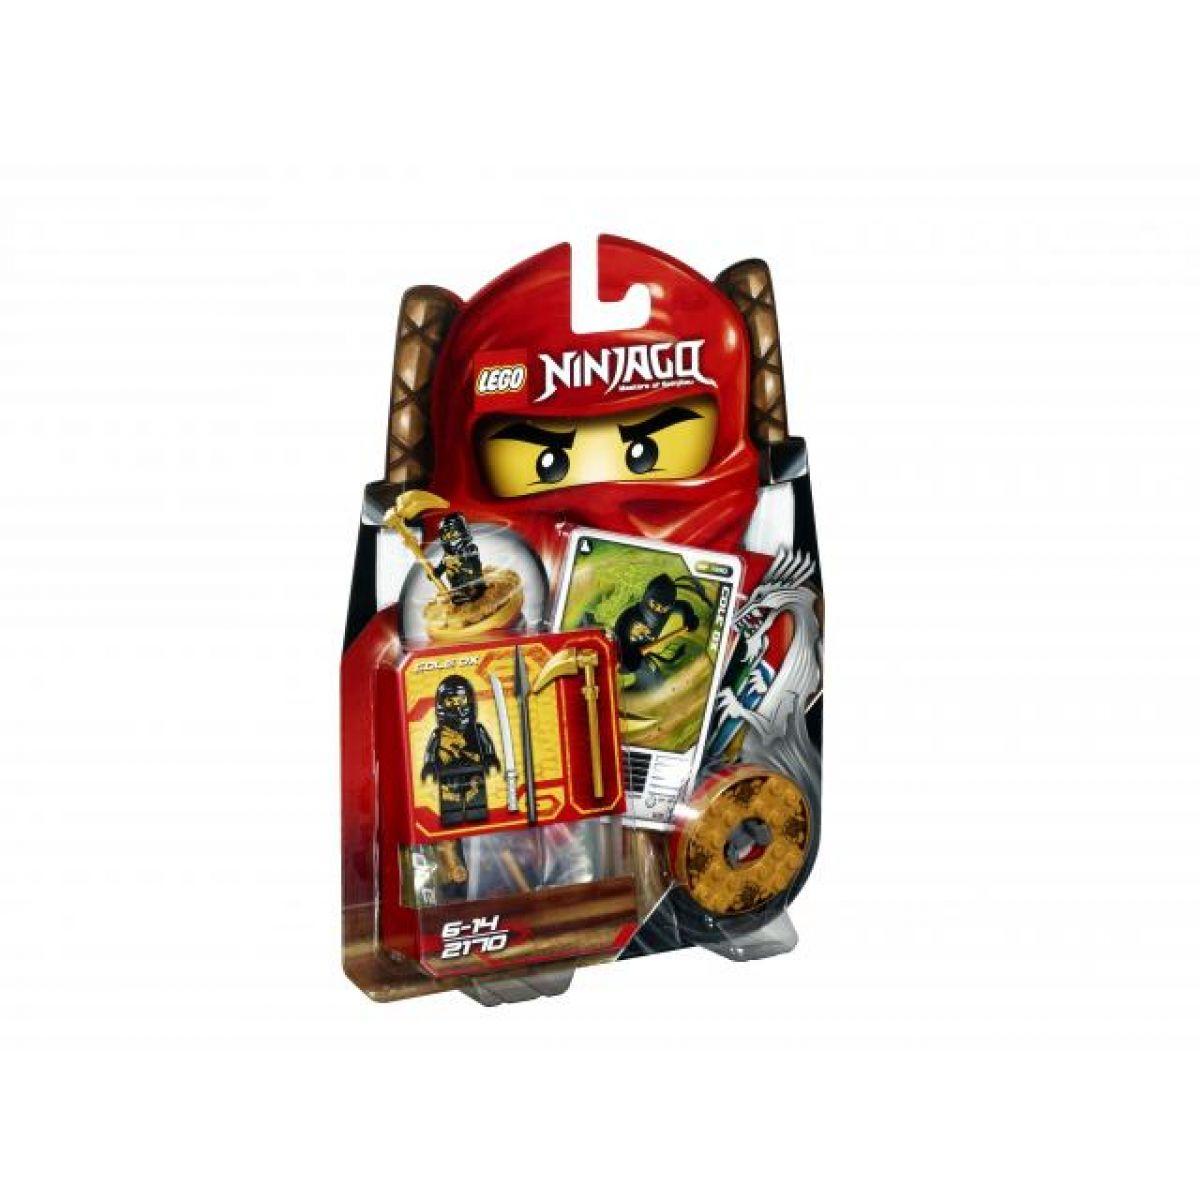 LEGO 2170 Ninjago Cole DX